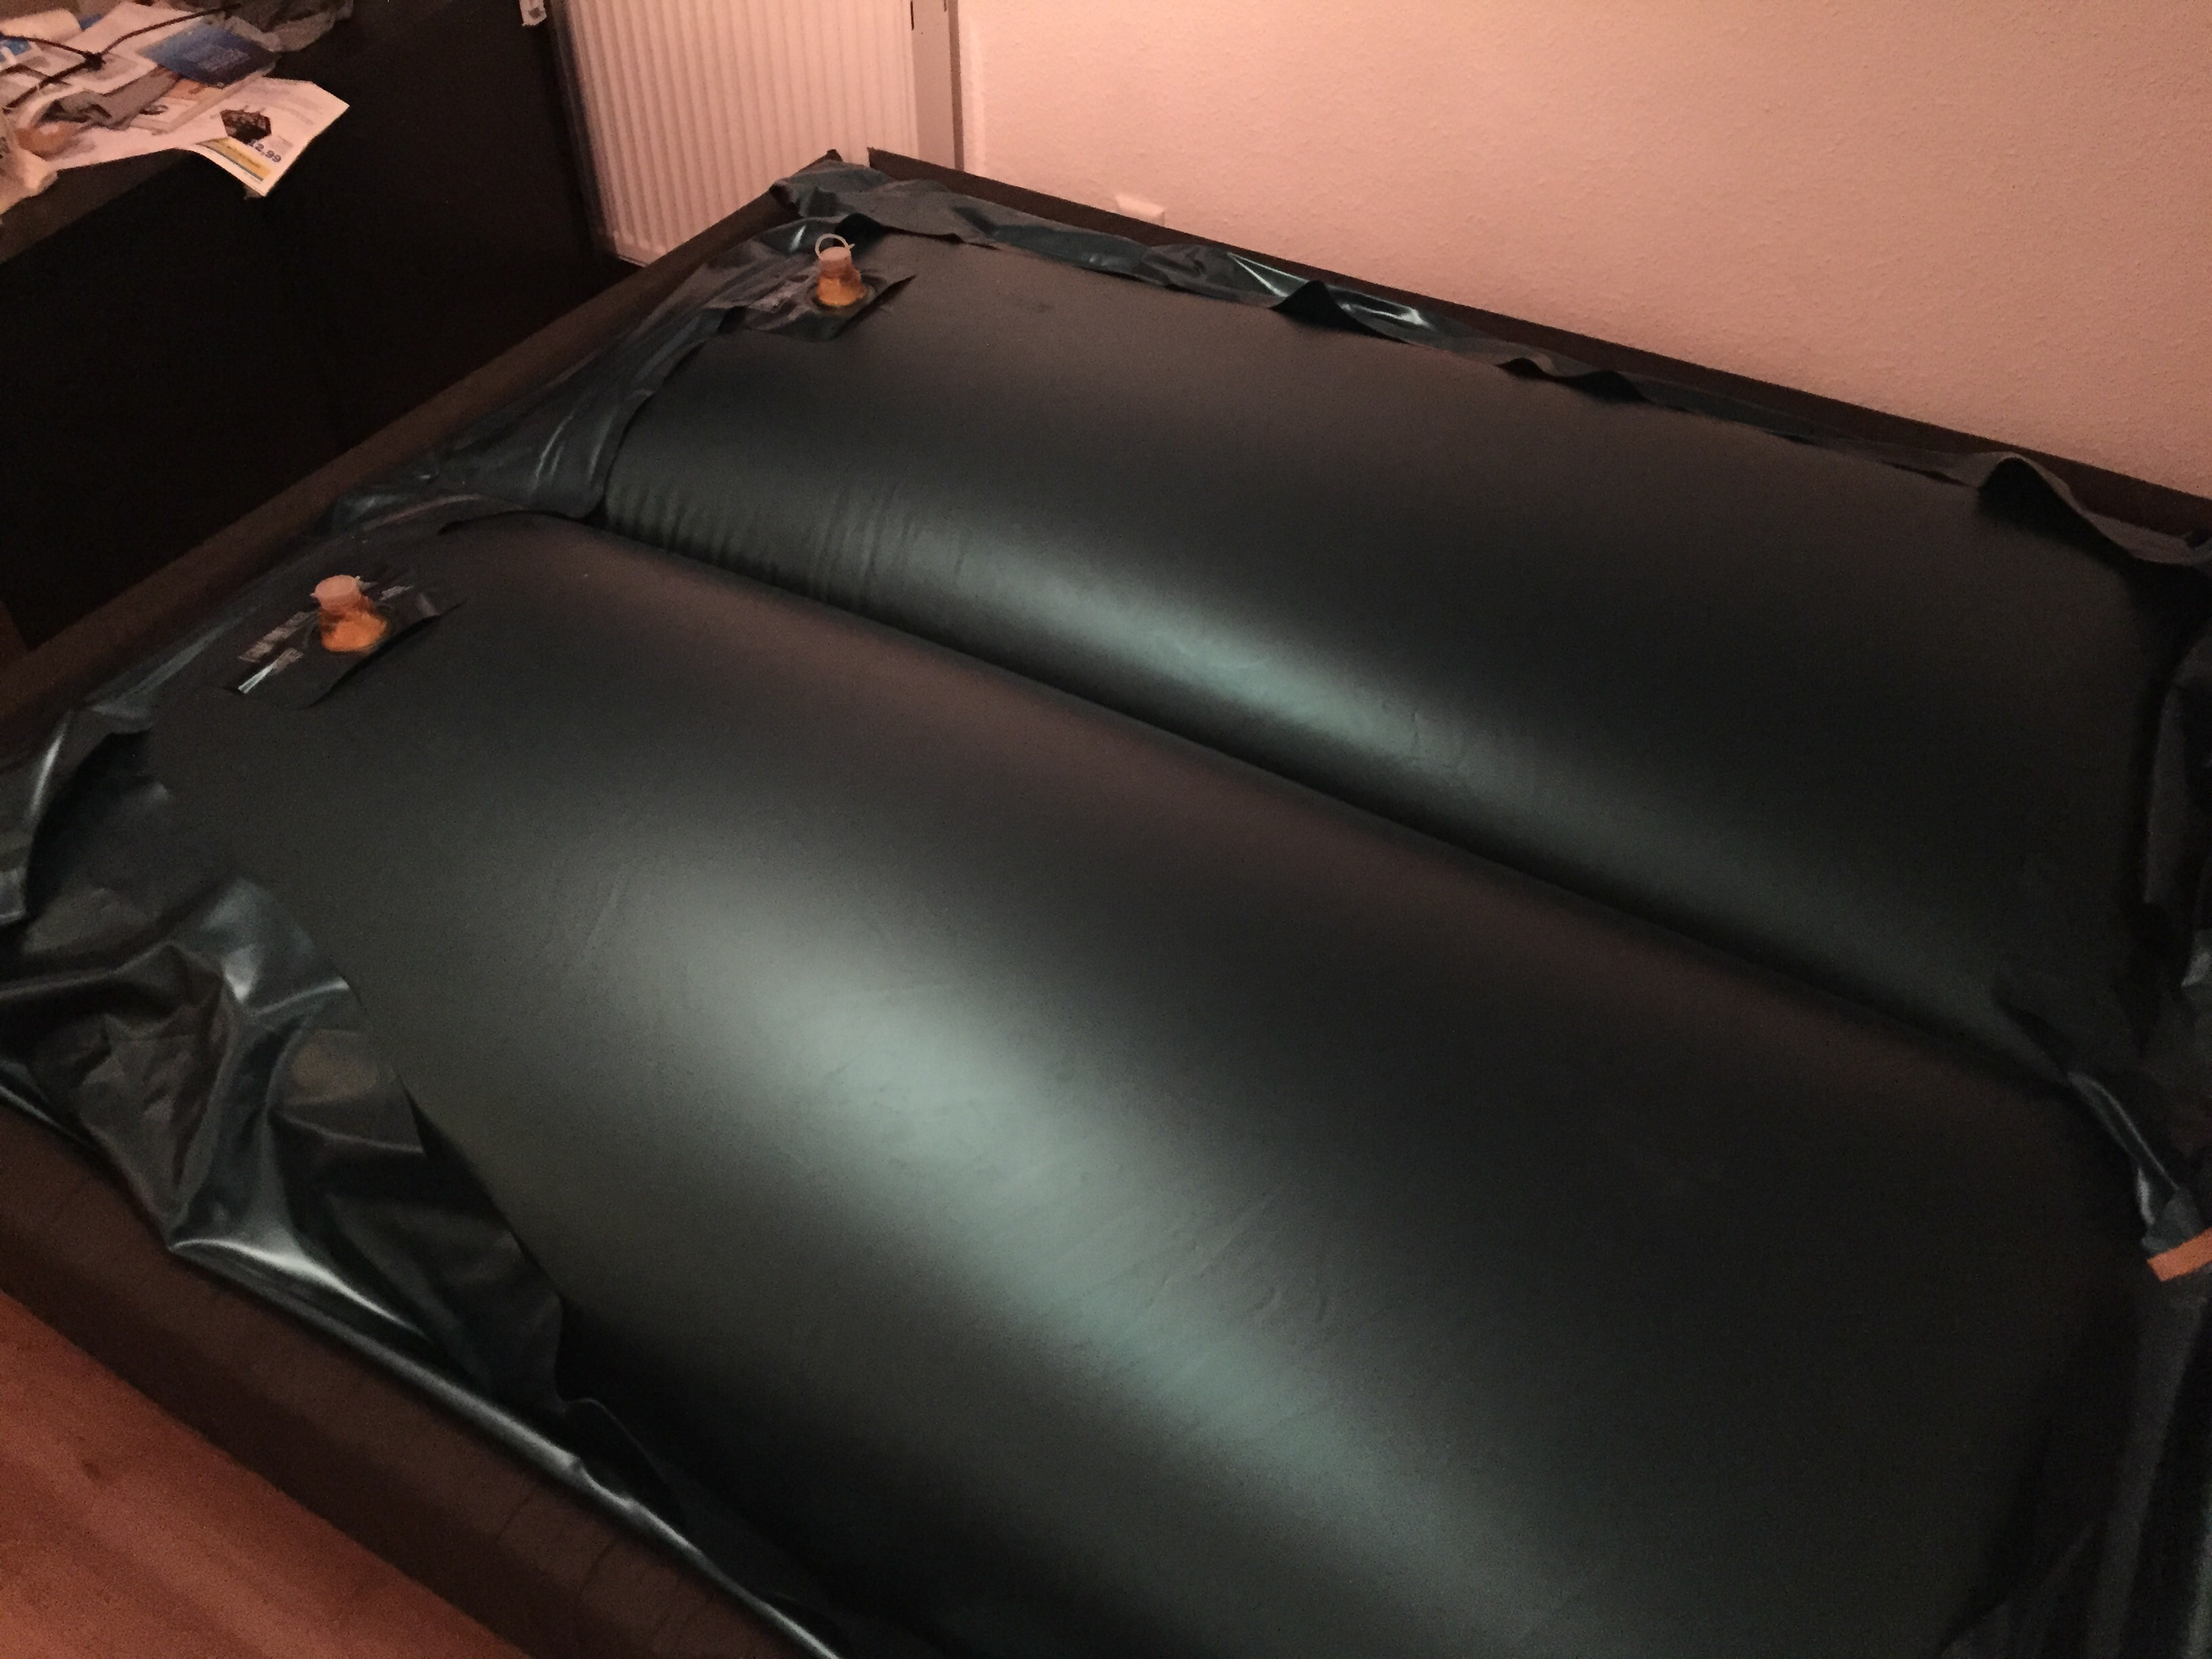 wasserbettmatratze sehen aus wie ballons bett matratze. Black Bedroom Furniture Sets. Home Design Ideas